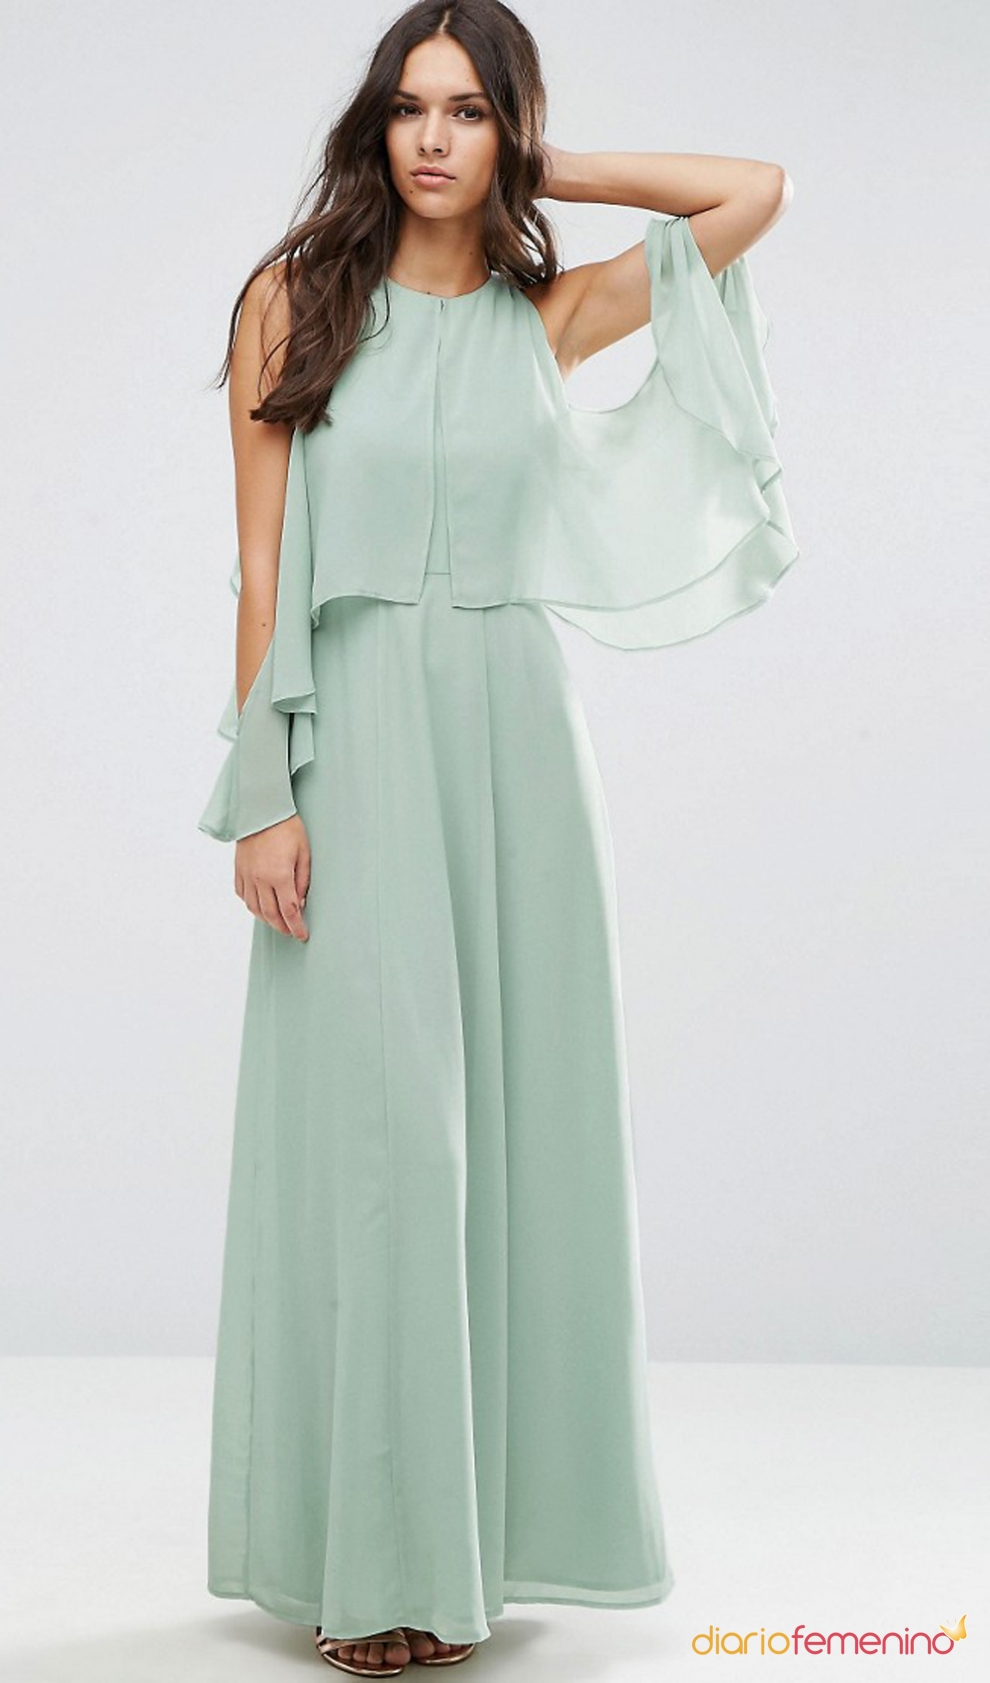 Awesome Vestido De Novia Kate Middleton Pattern - All Wedding ...